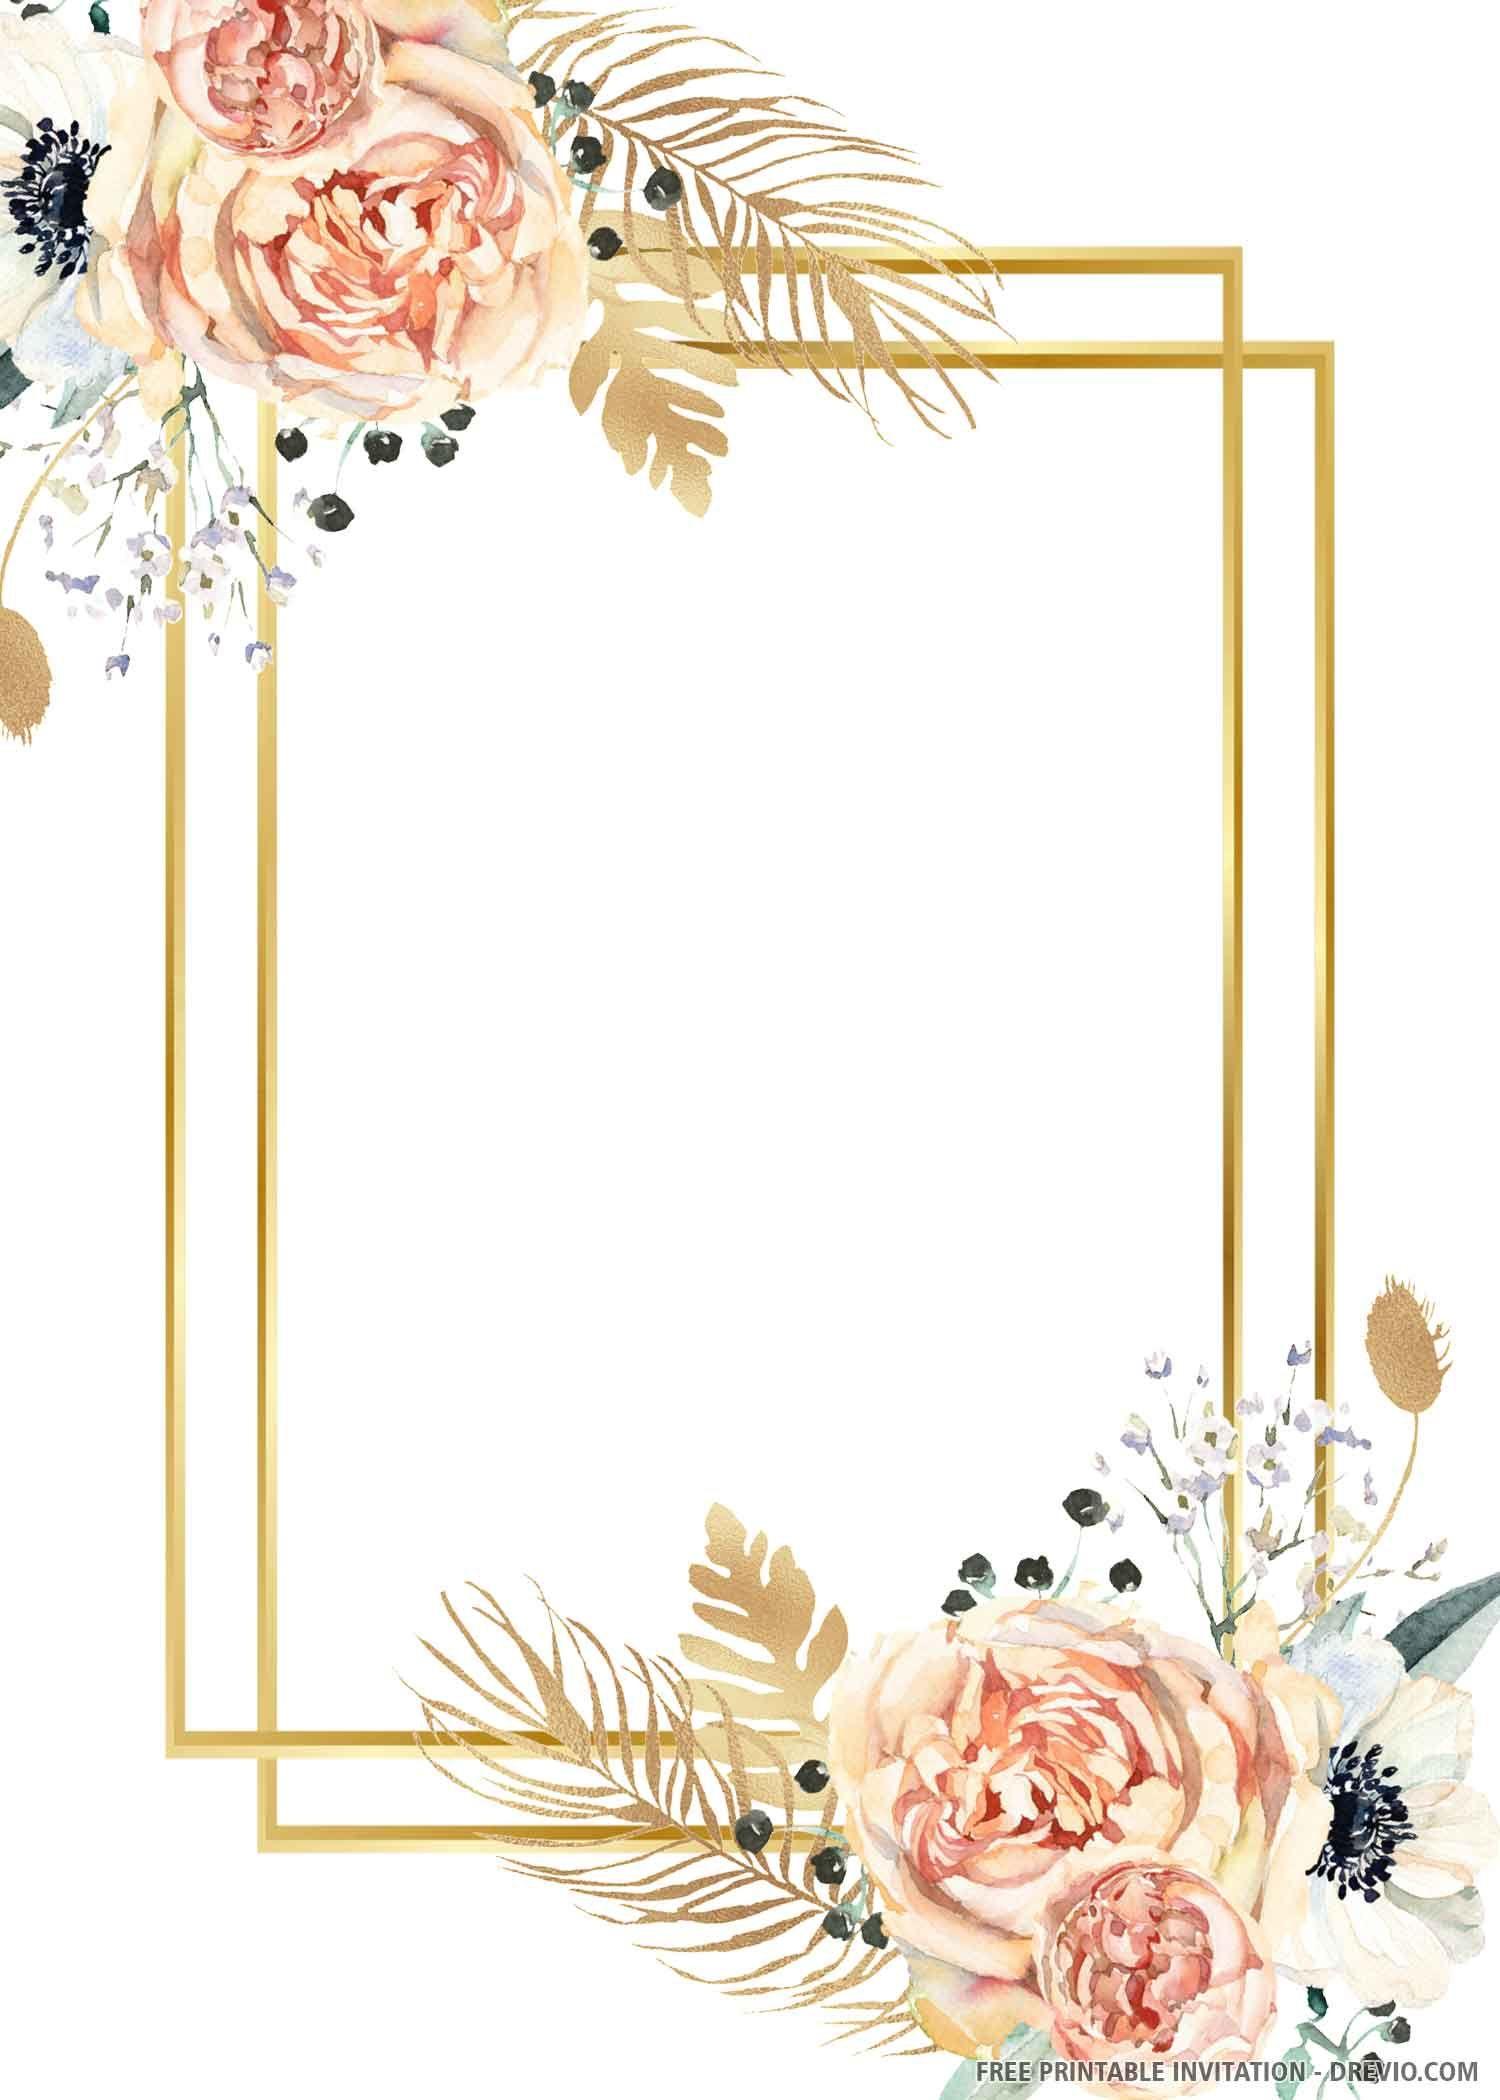 Free Printable Gold Wedding Invitation Template Wedding Invitation Background Free Wedding Invitation Templates Free Wedding Printables